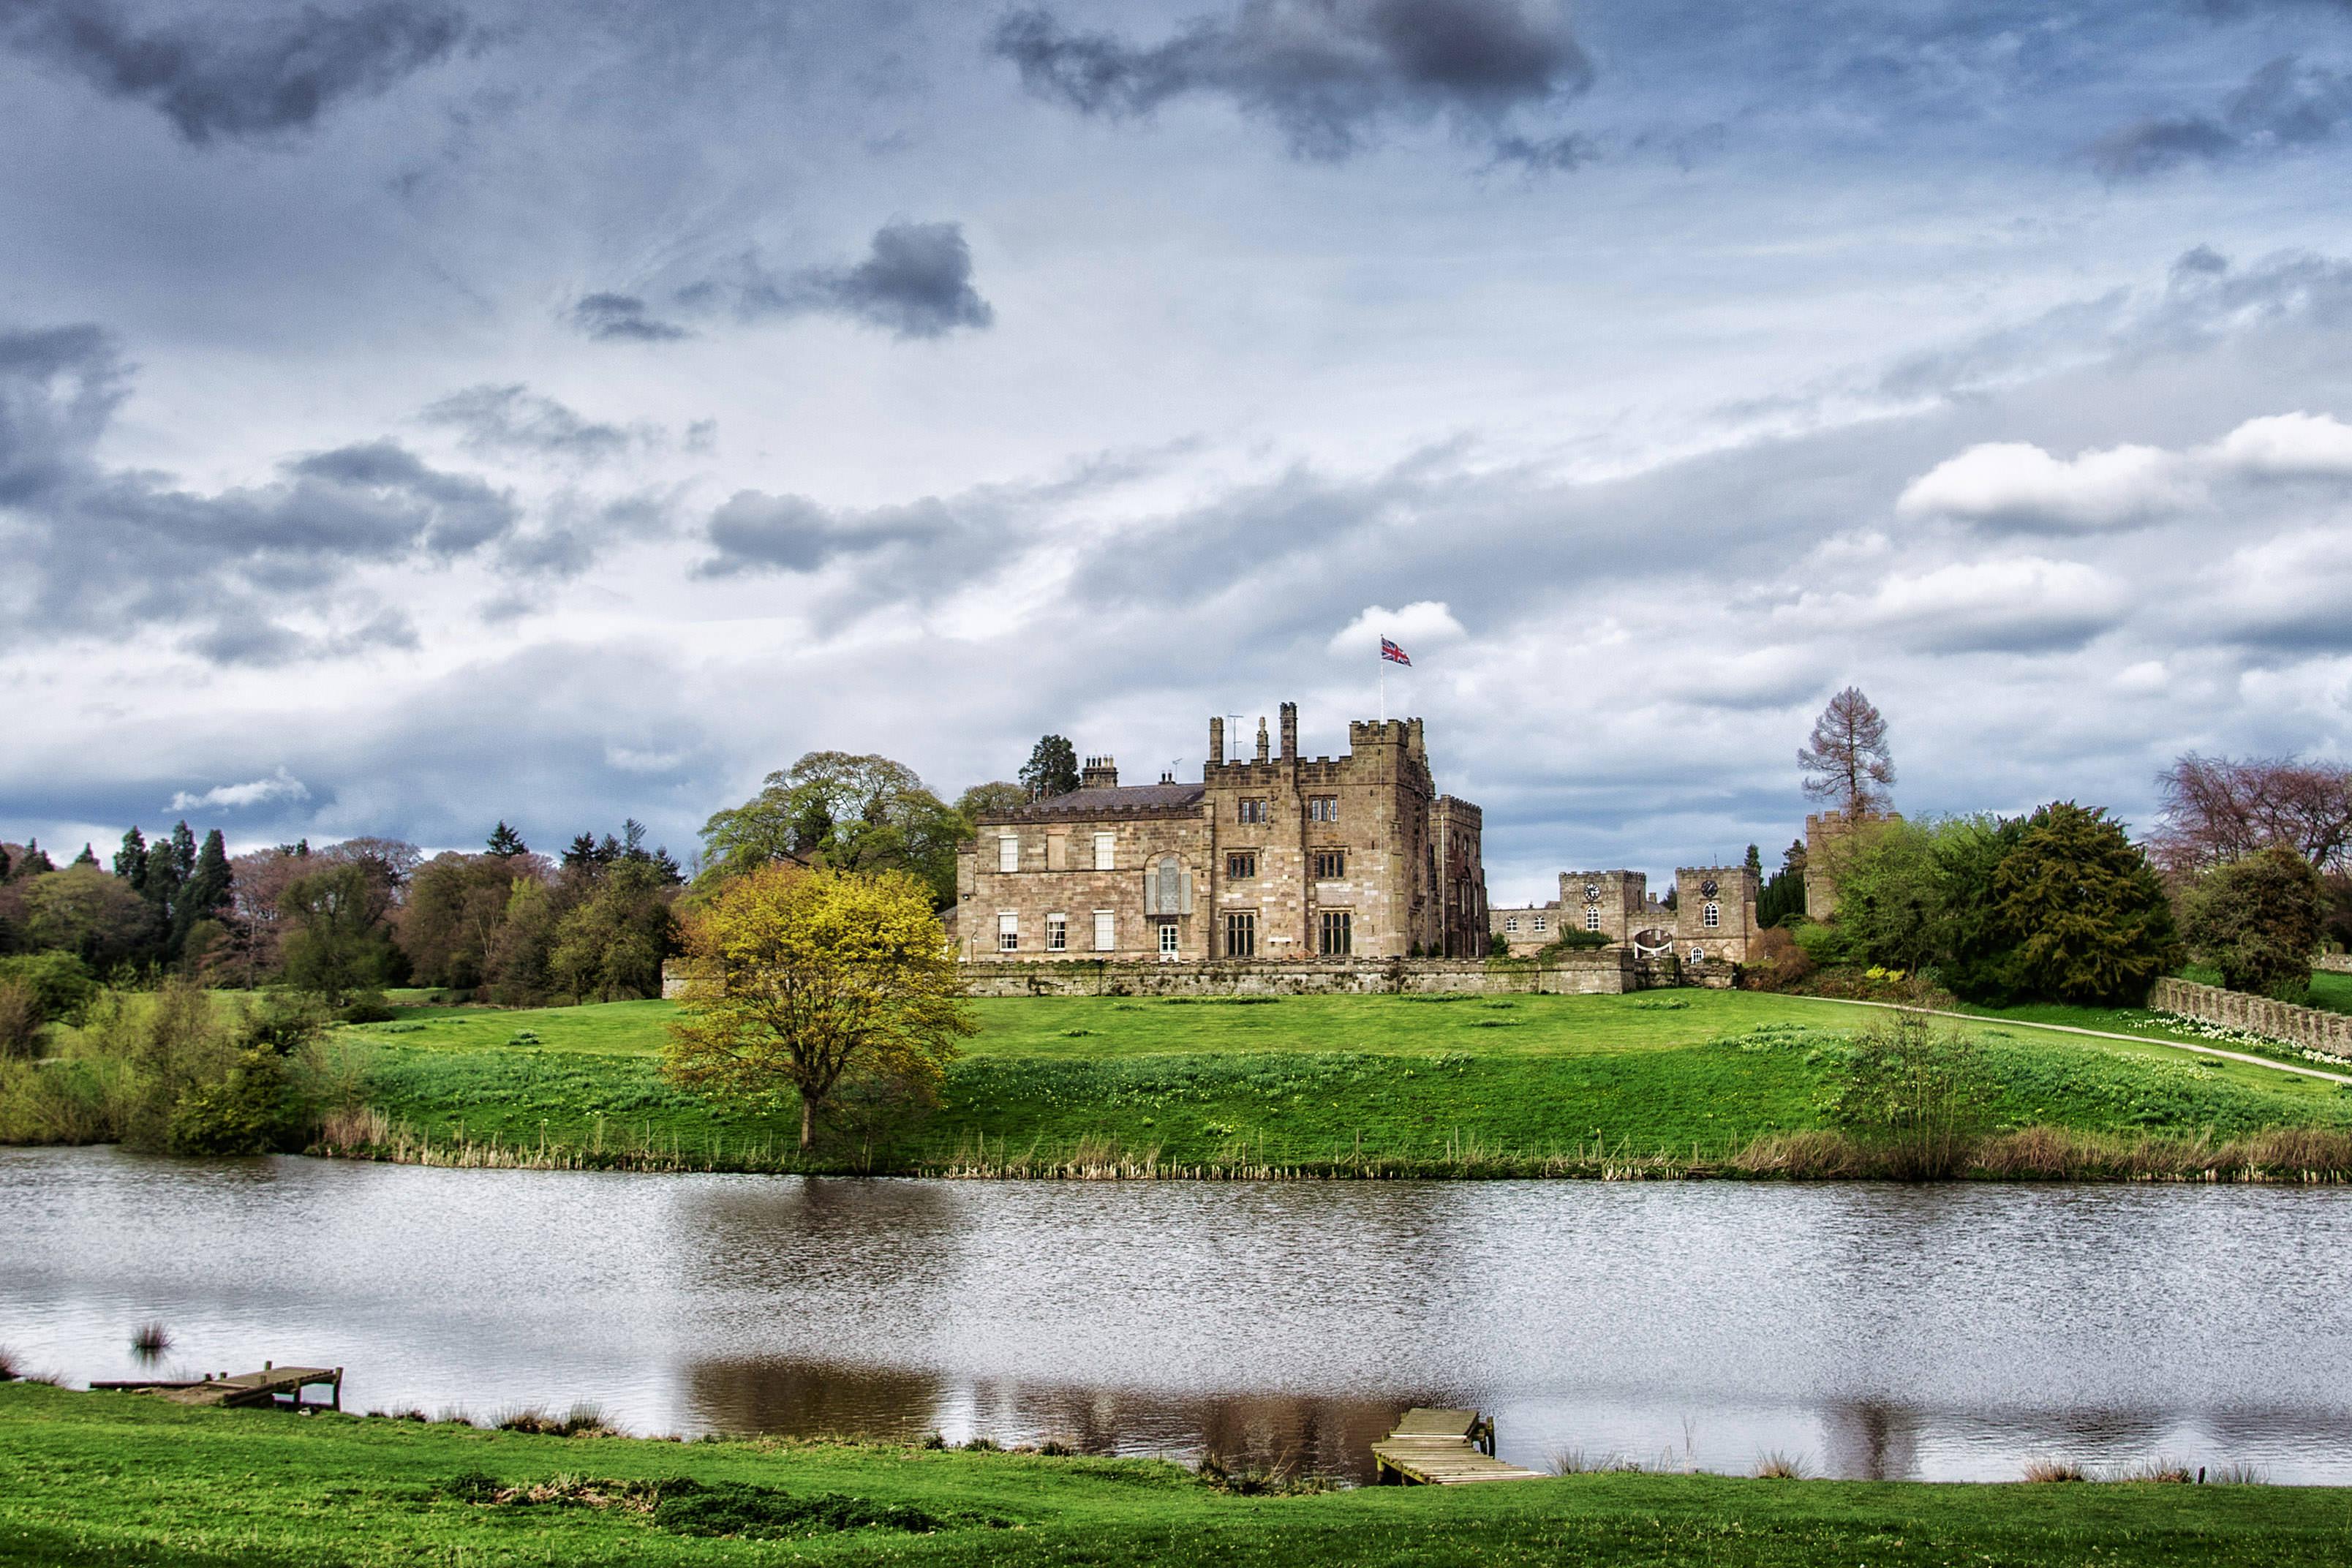 Ripley Castle Marquee